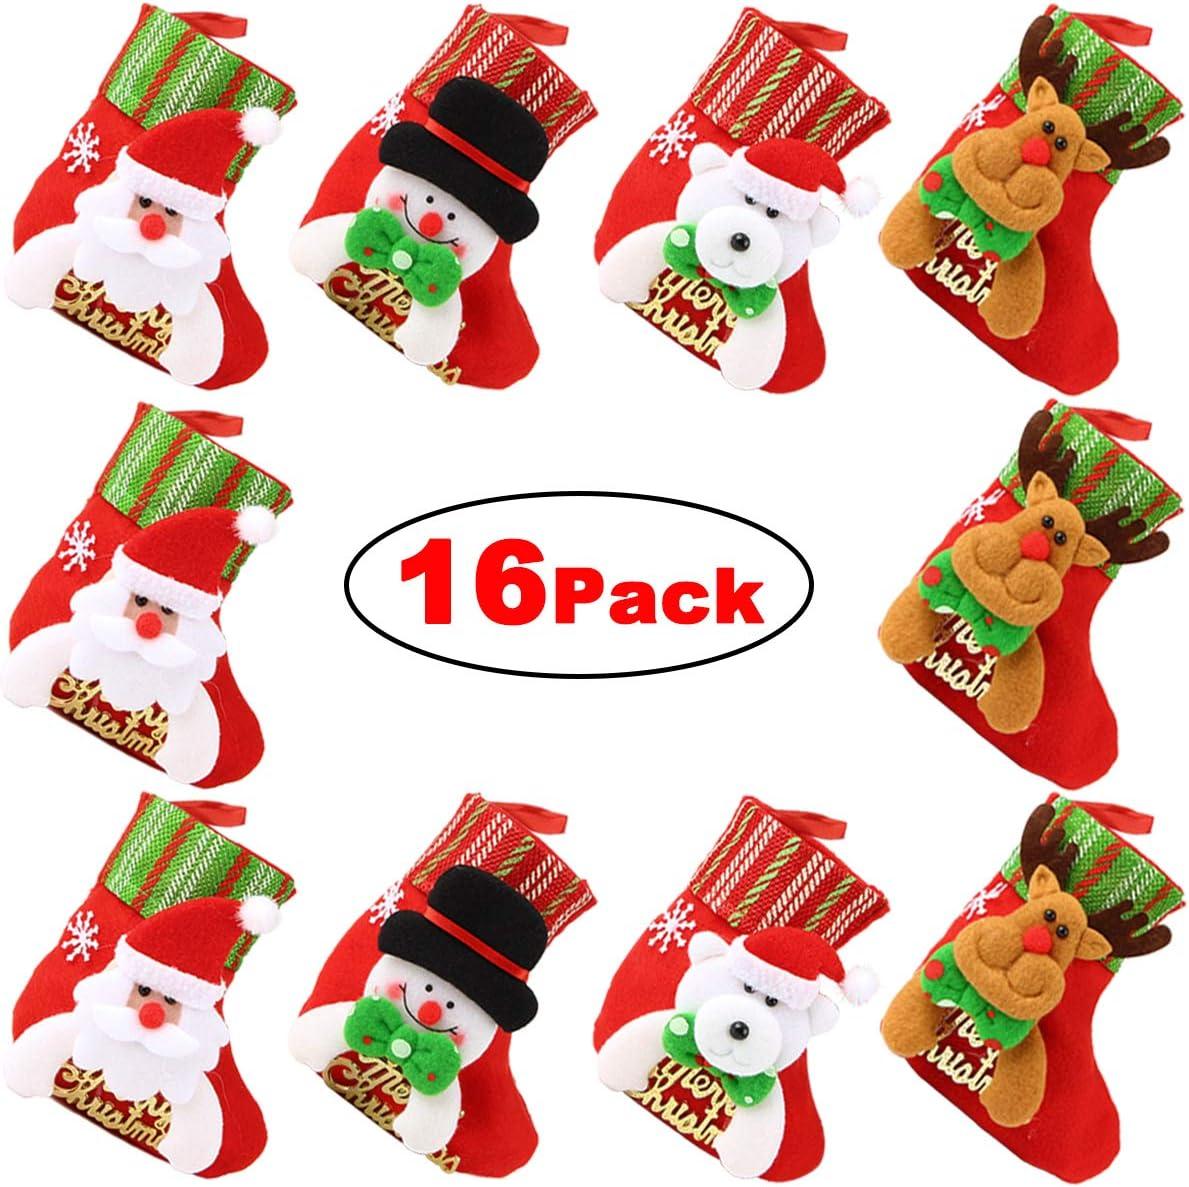 "Dreampark Mini Christmas Stocking, (16 Pack) Xmas Stocking Christmas Tree Ornaments Decorations 6"" - Santa Snowman Reindeer Bear Character"